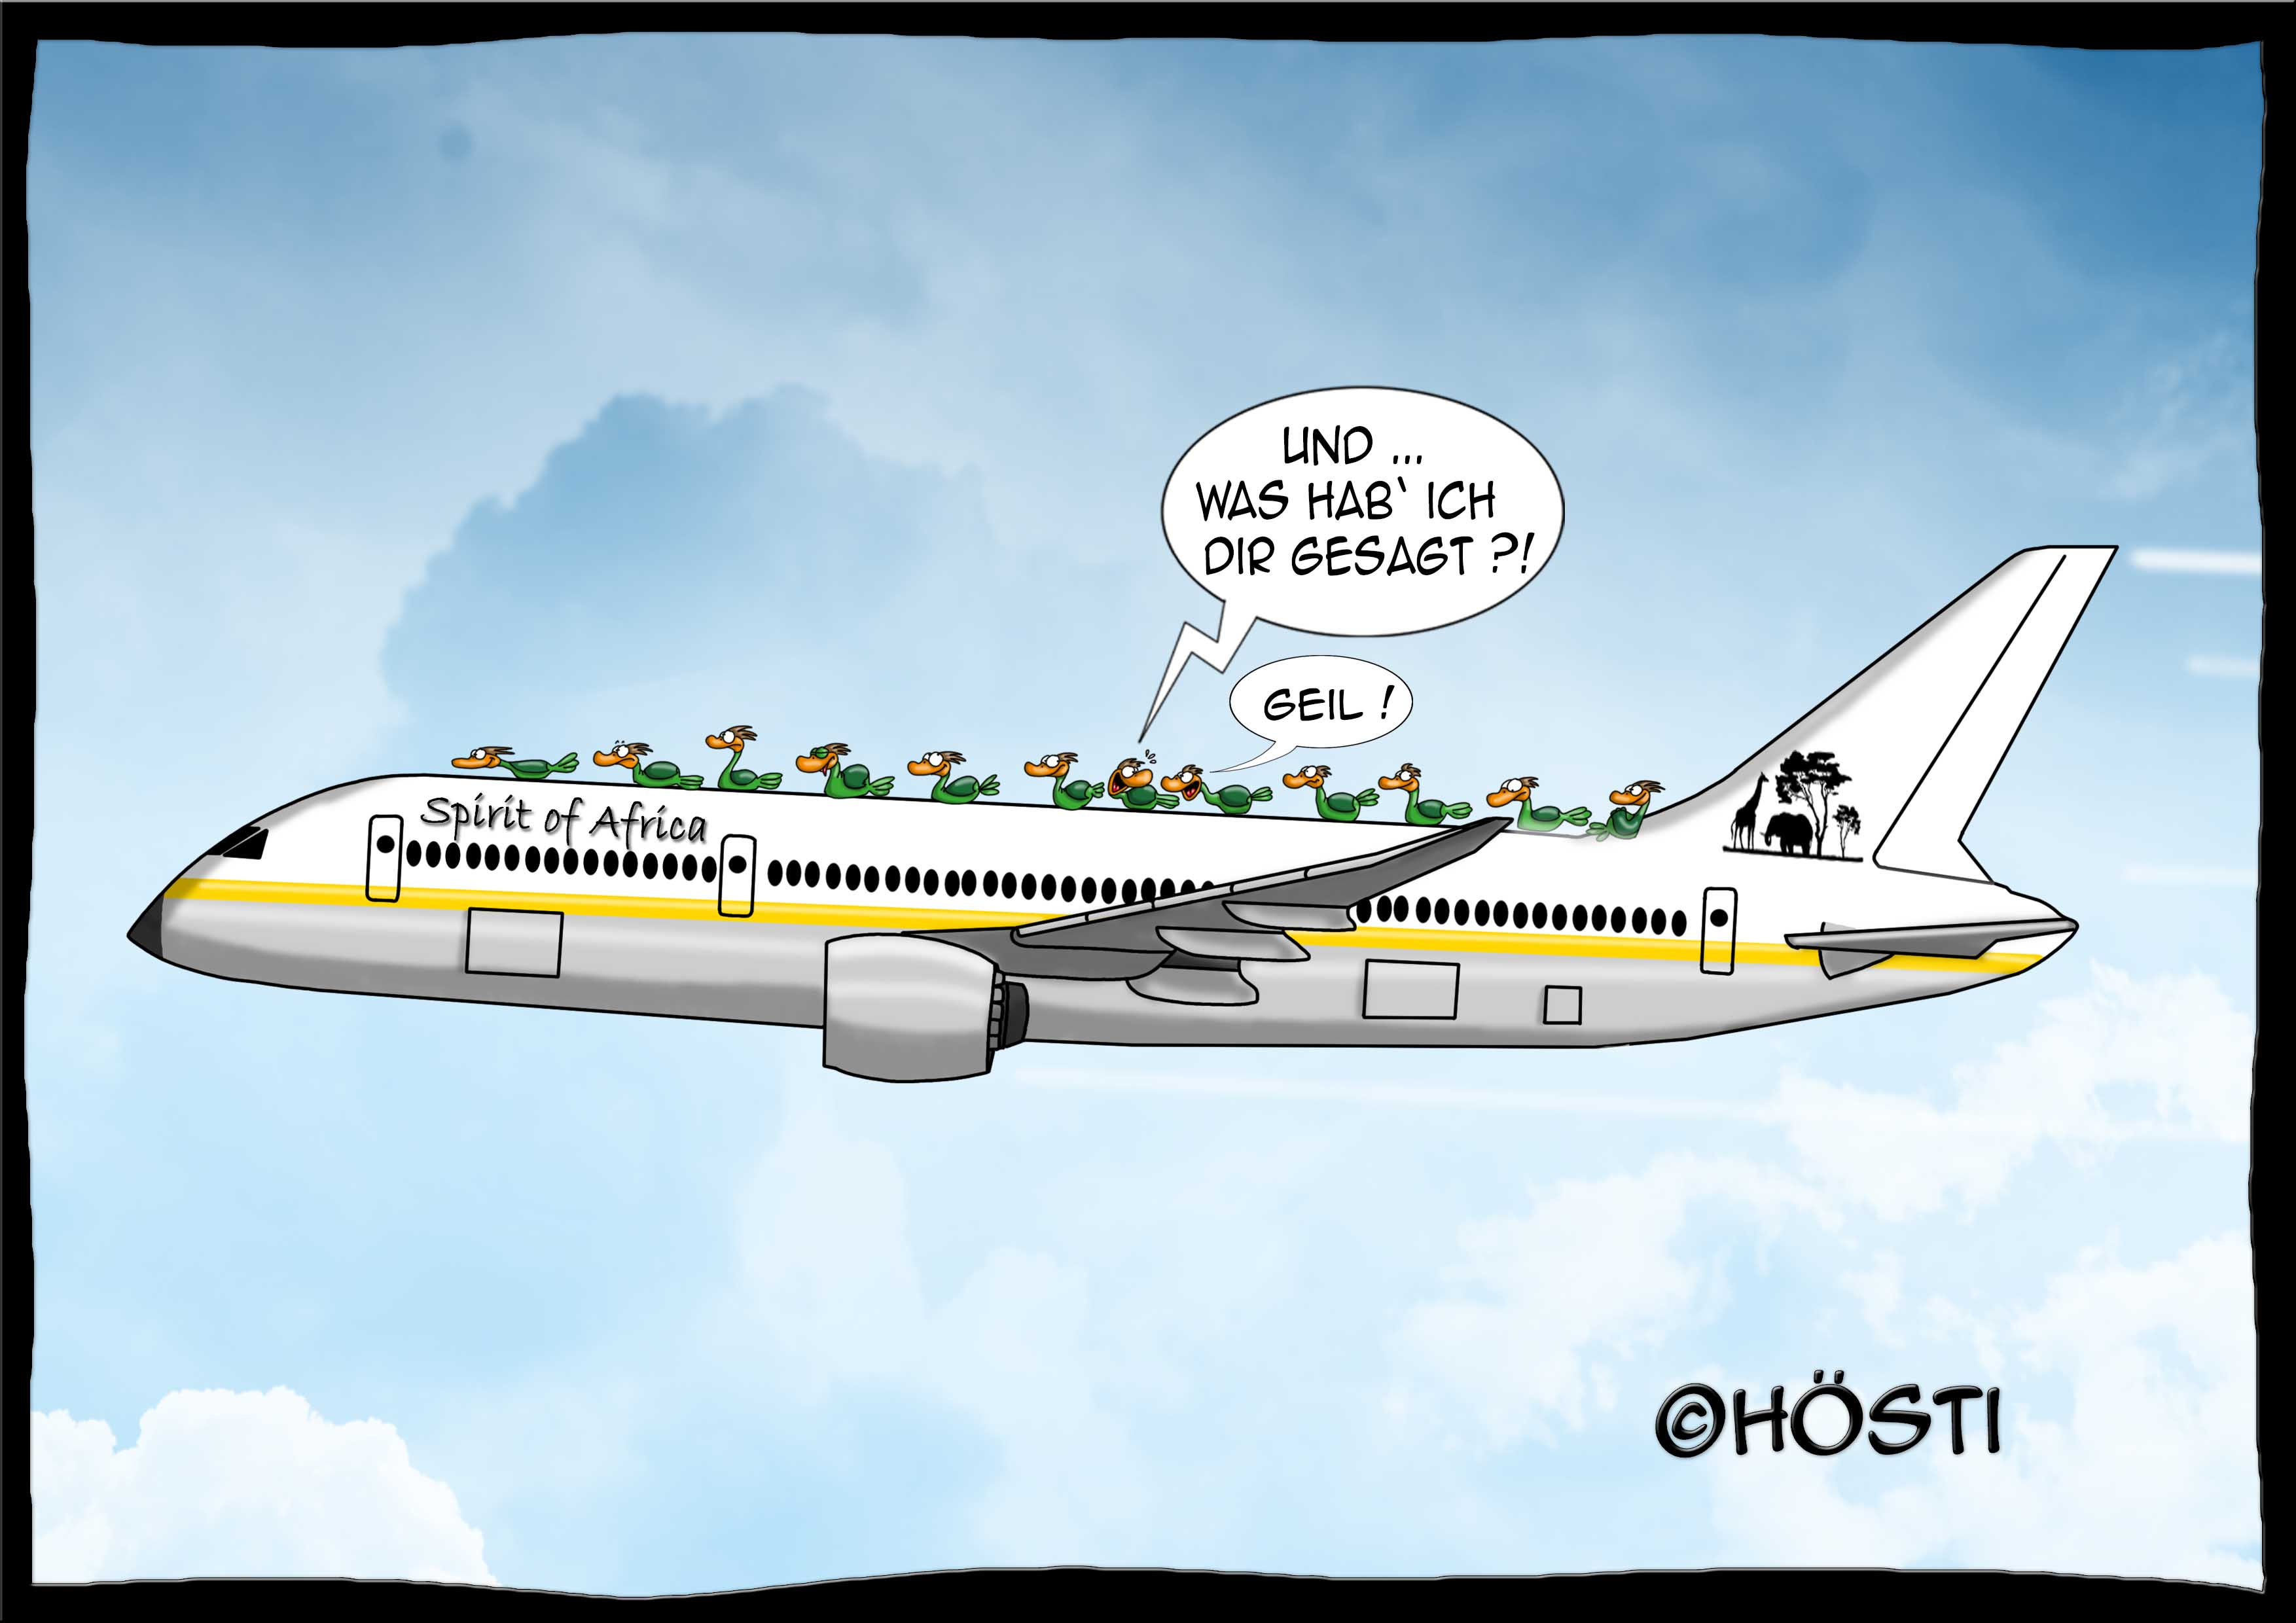 HVK zugvögel by airplane frei abg